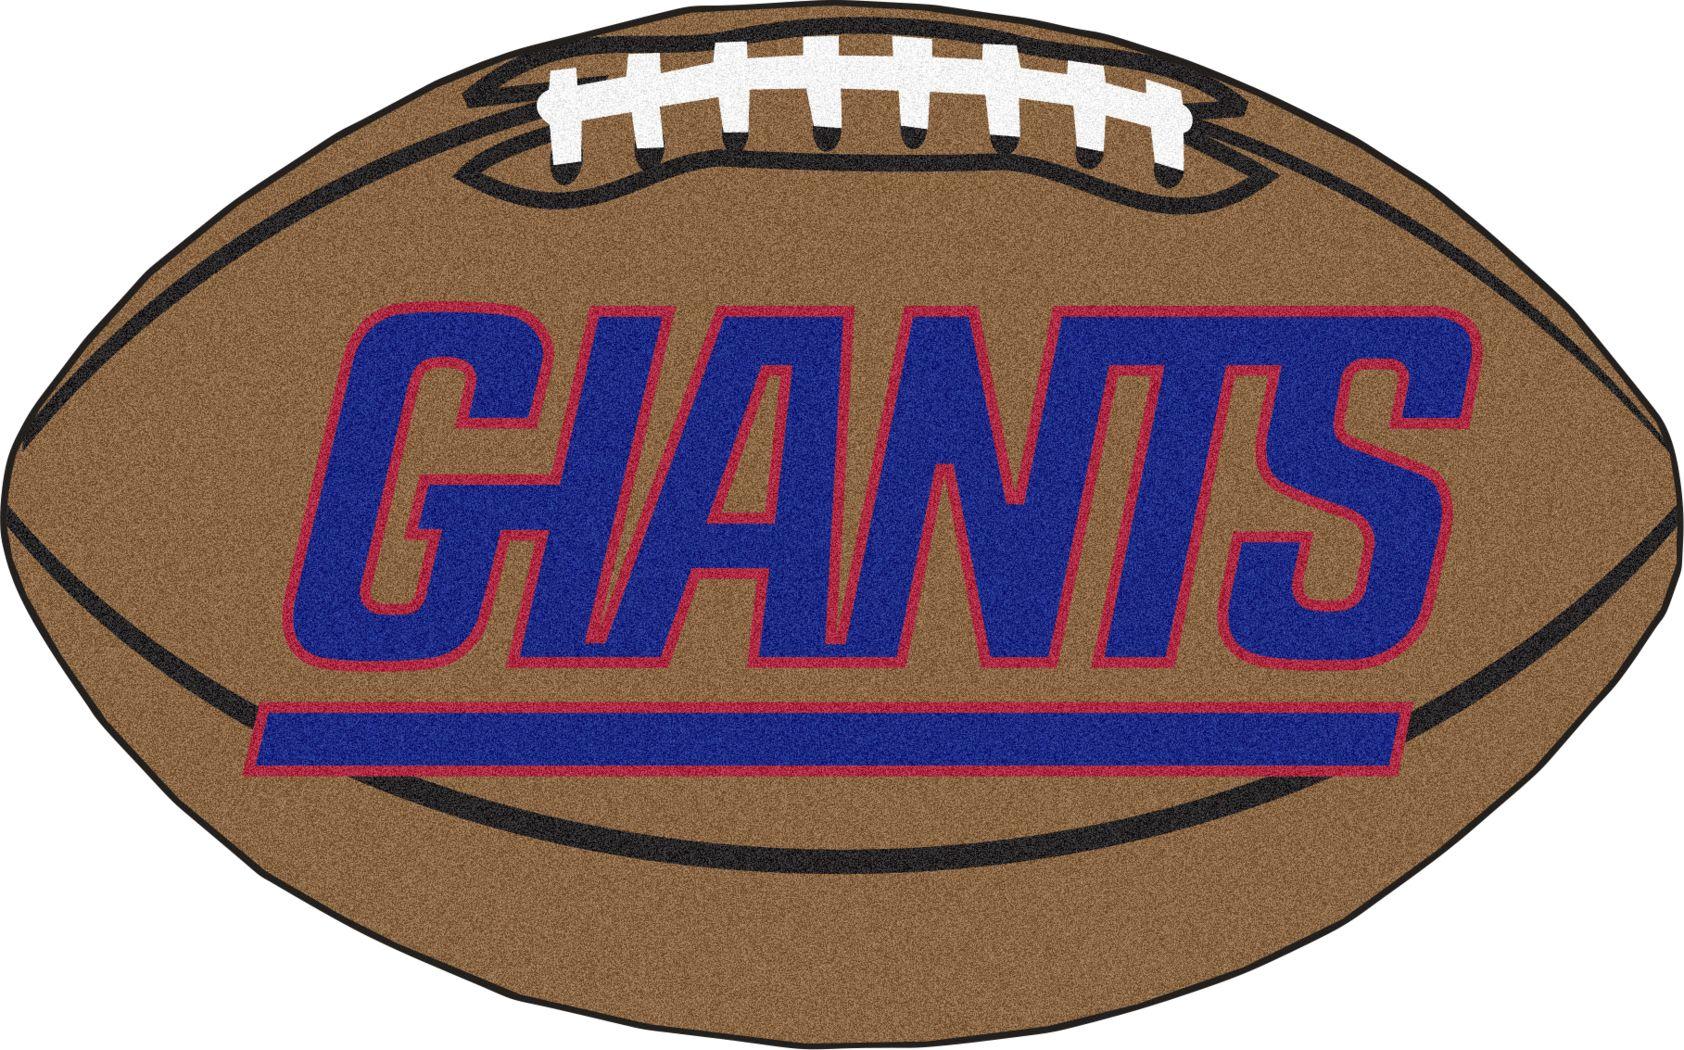 "NFL Football Mascot New York Giants 1'6"" x 1'10"" Rug"